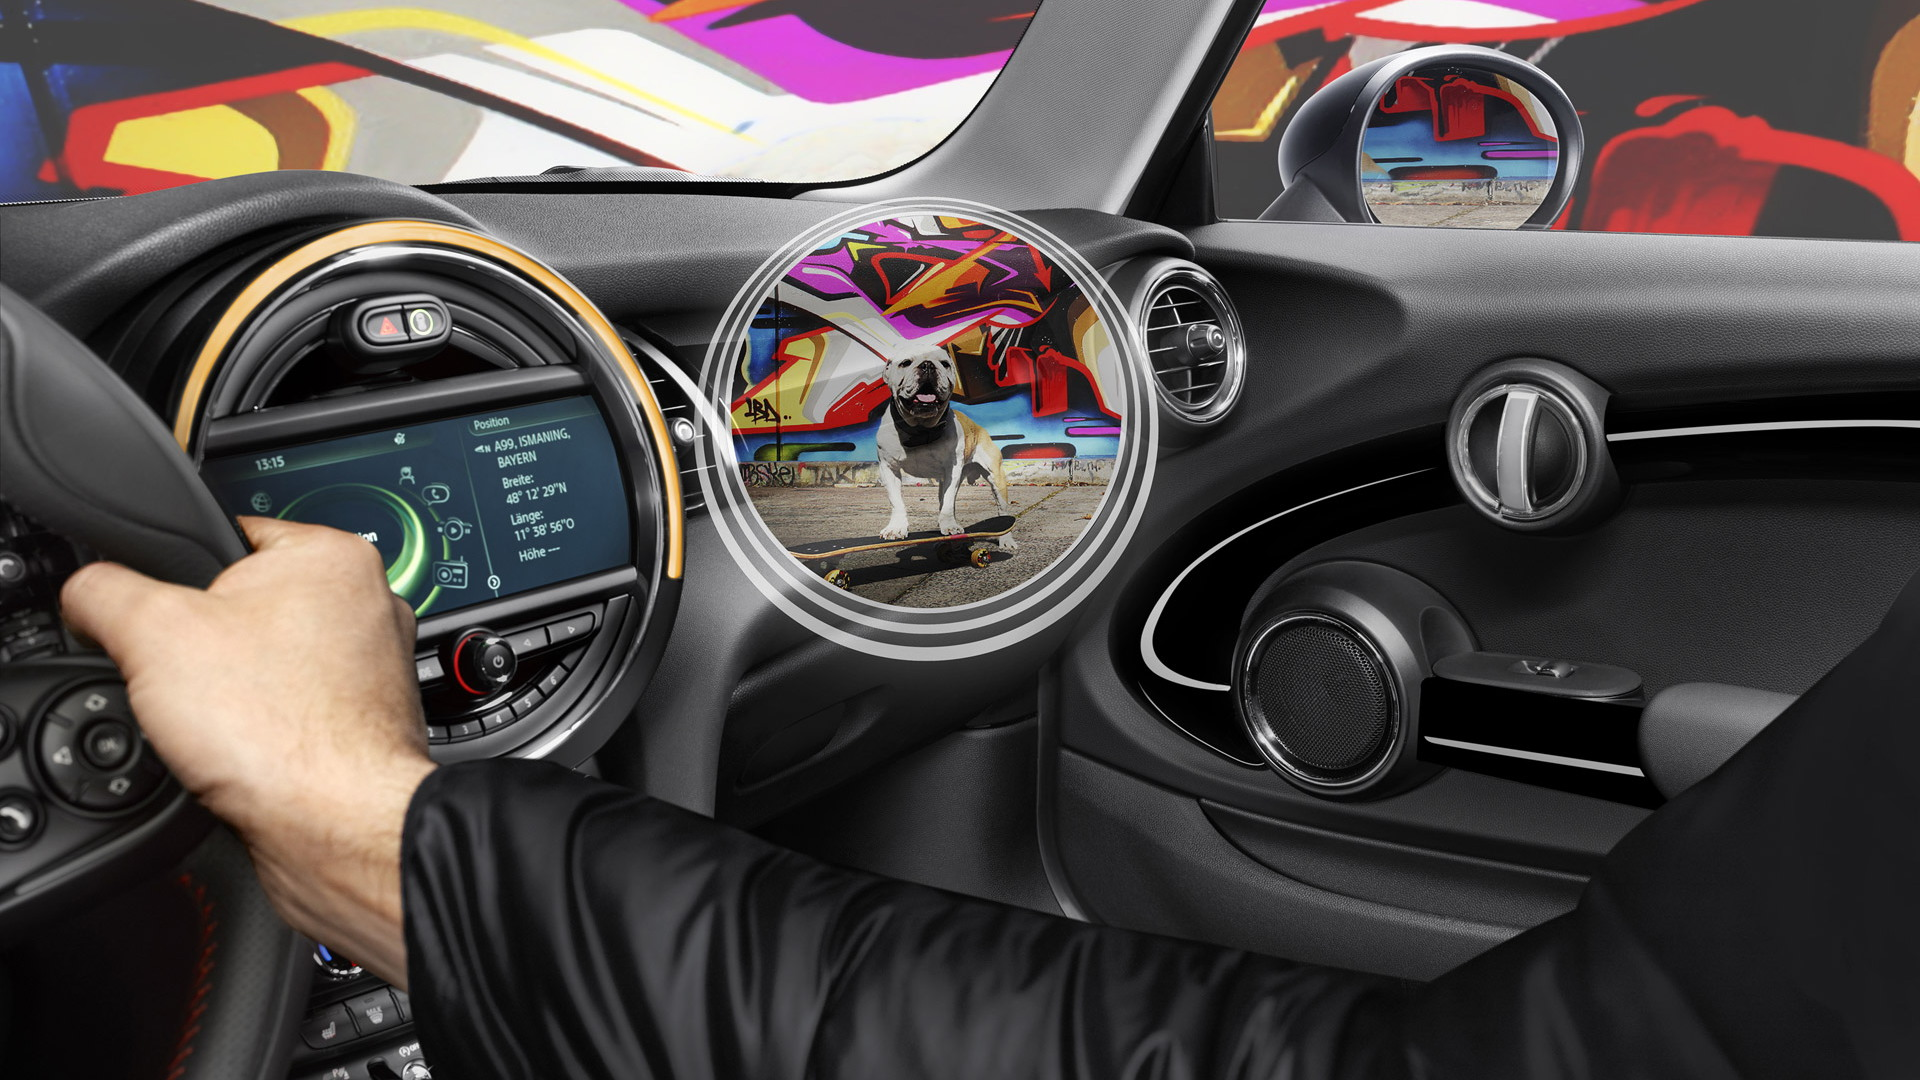 MINI Augmented Vision concept, 2015 Shanghai Auto Show